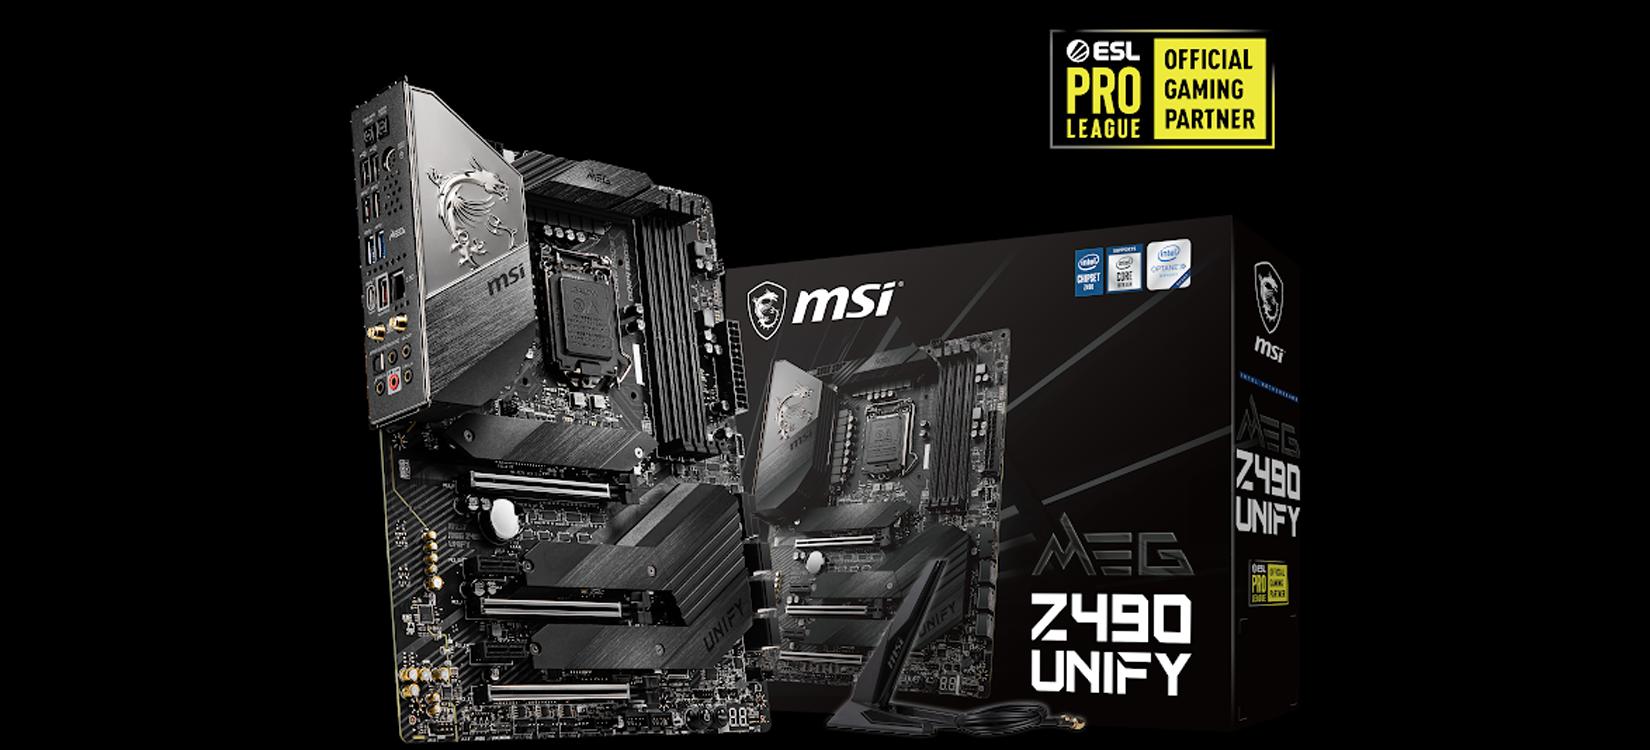 Mainboard MSI MEG Z490 UNIFY (Intel Z490, Socket 1200, ATX, 4 khe RAM DDR4)